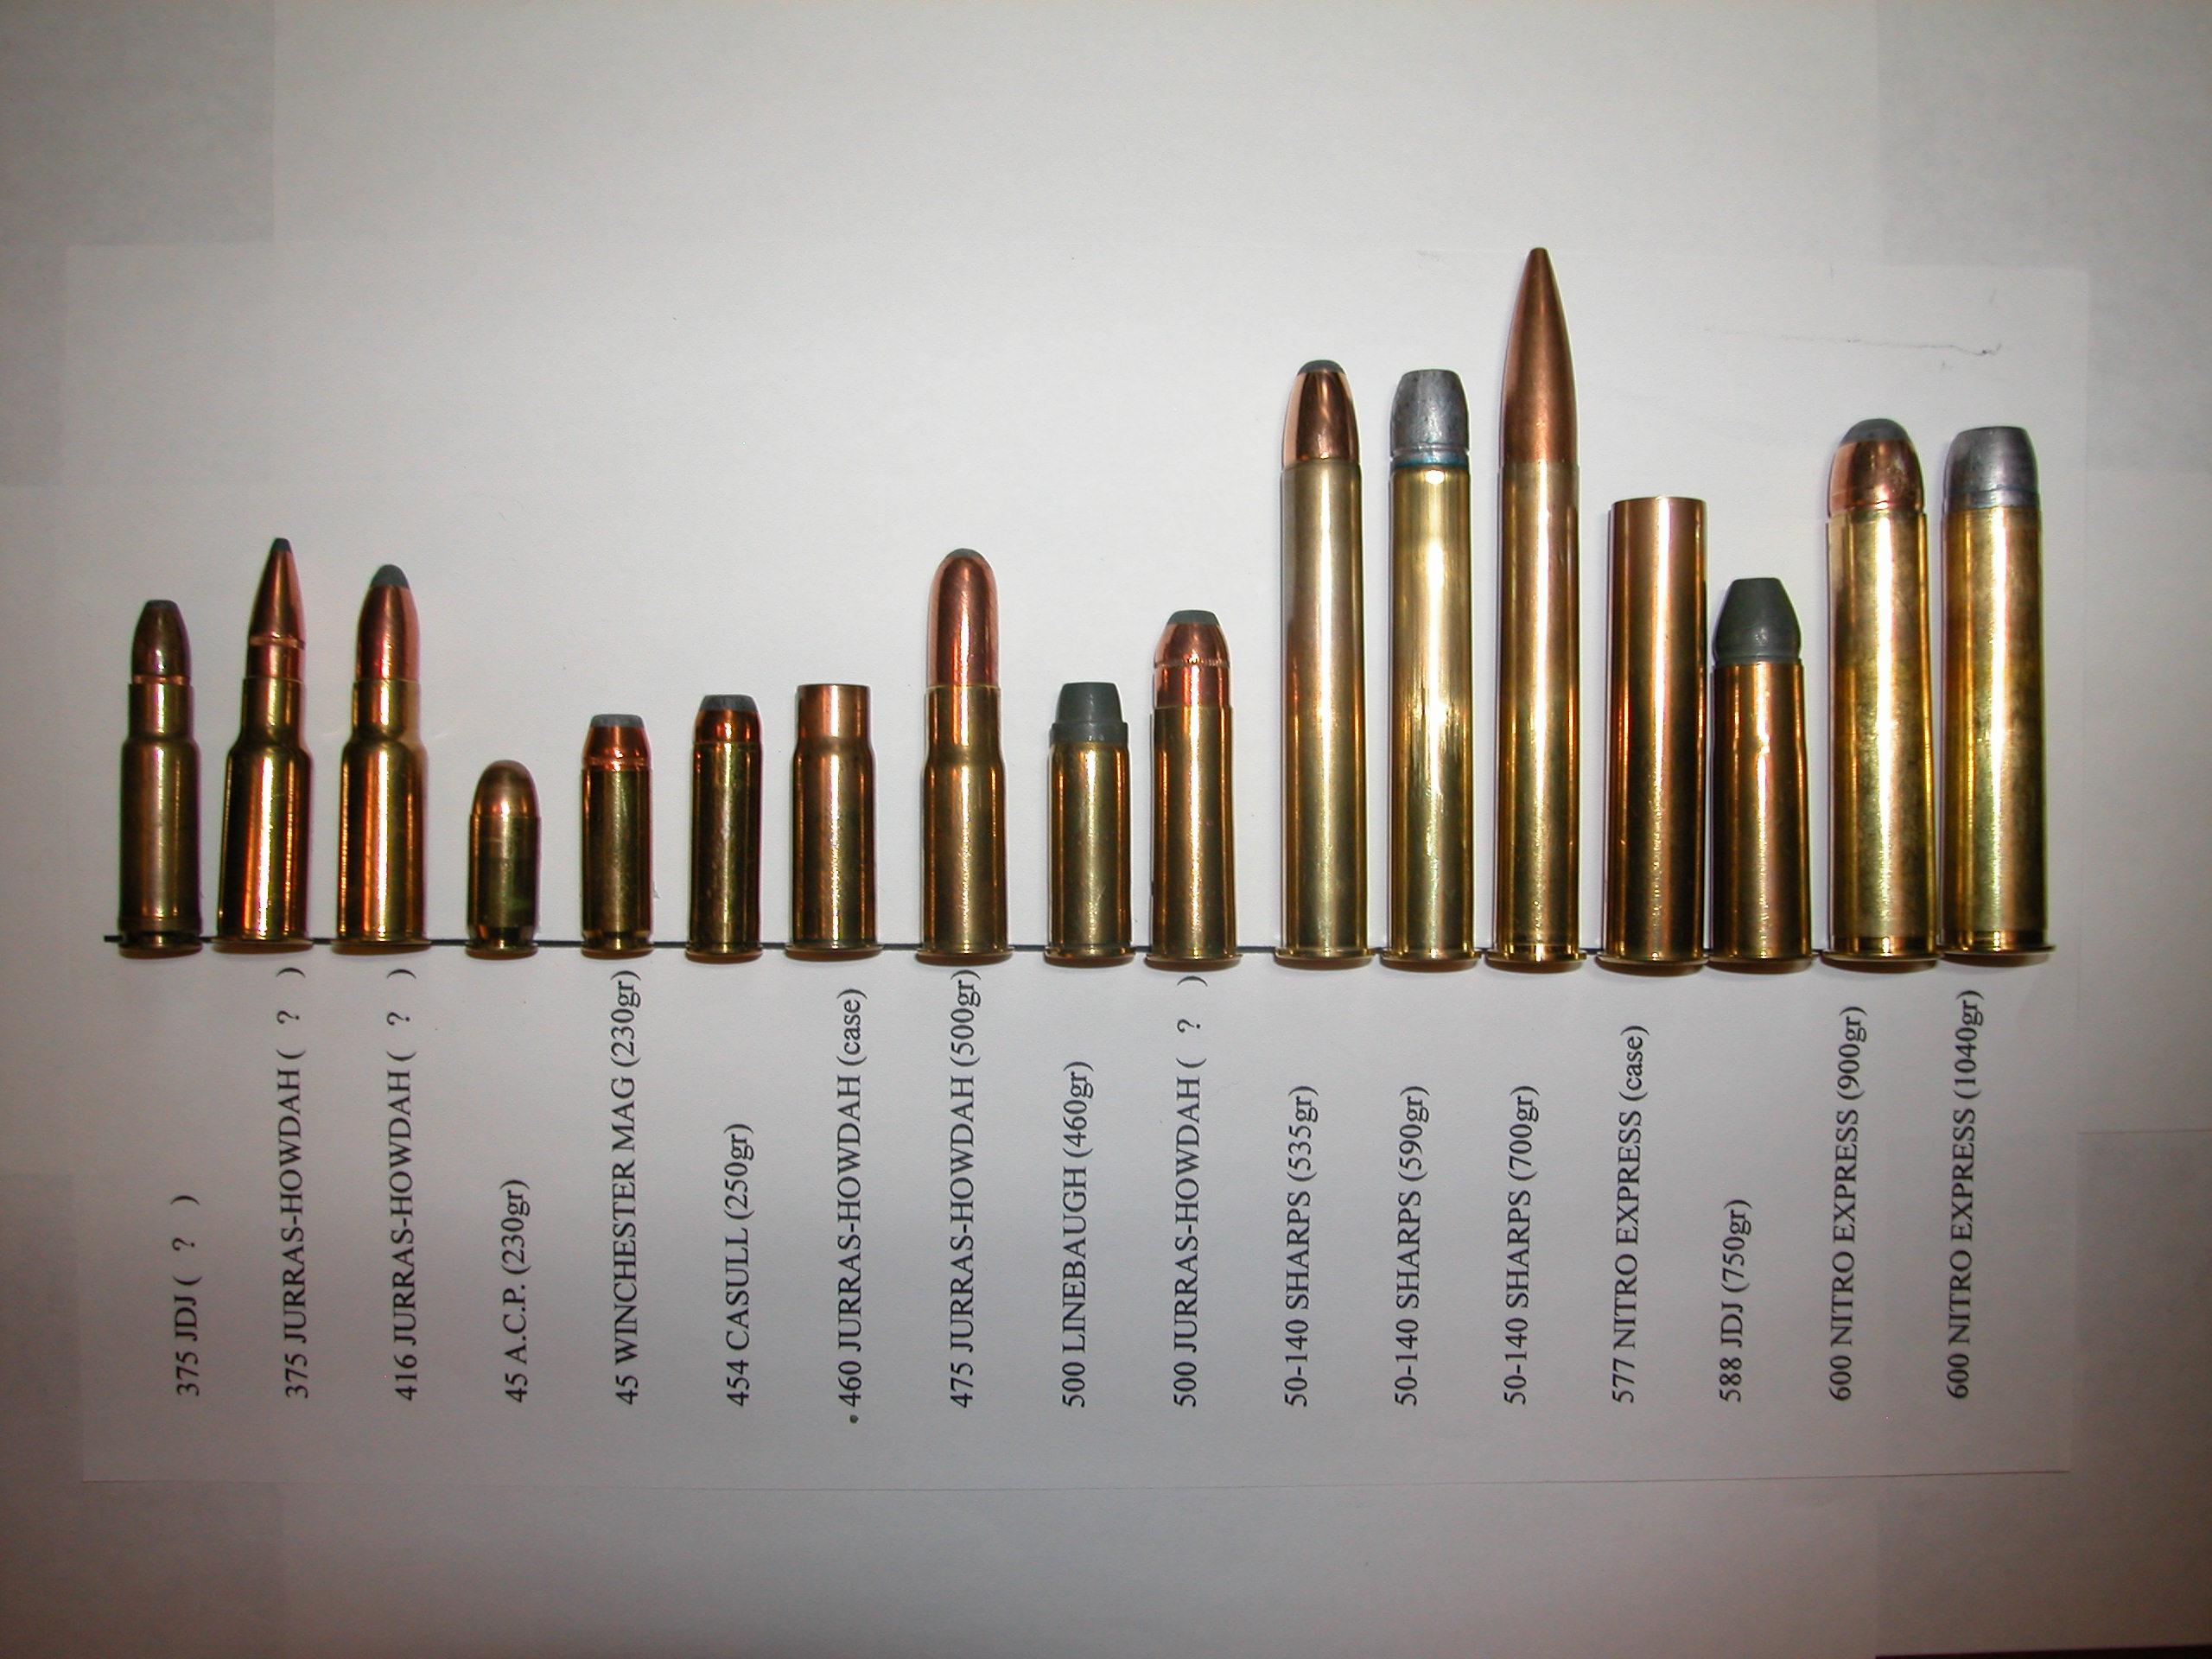 Rifle calibers comparison